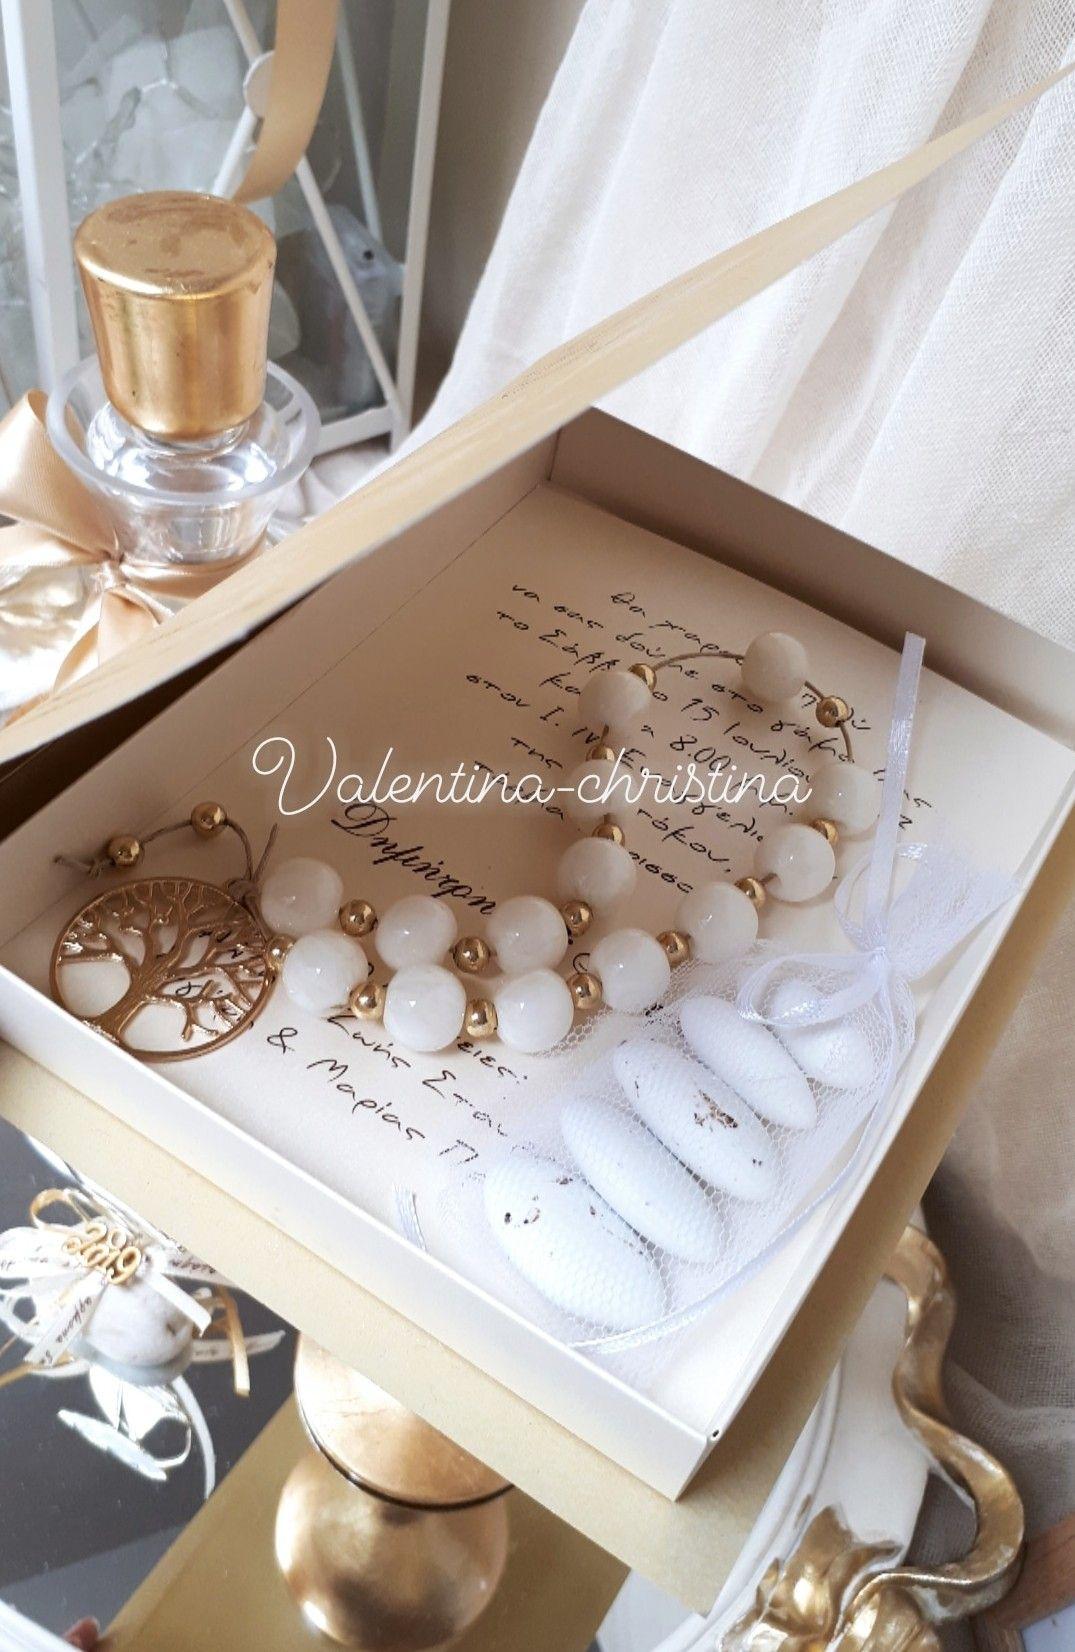 396ebce3bae7 Χειροποίητες μπομπονιέρες γάμου